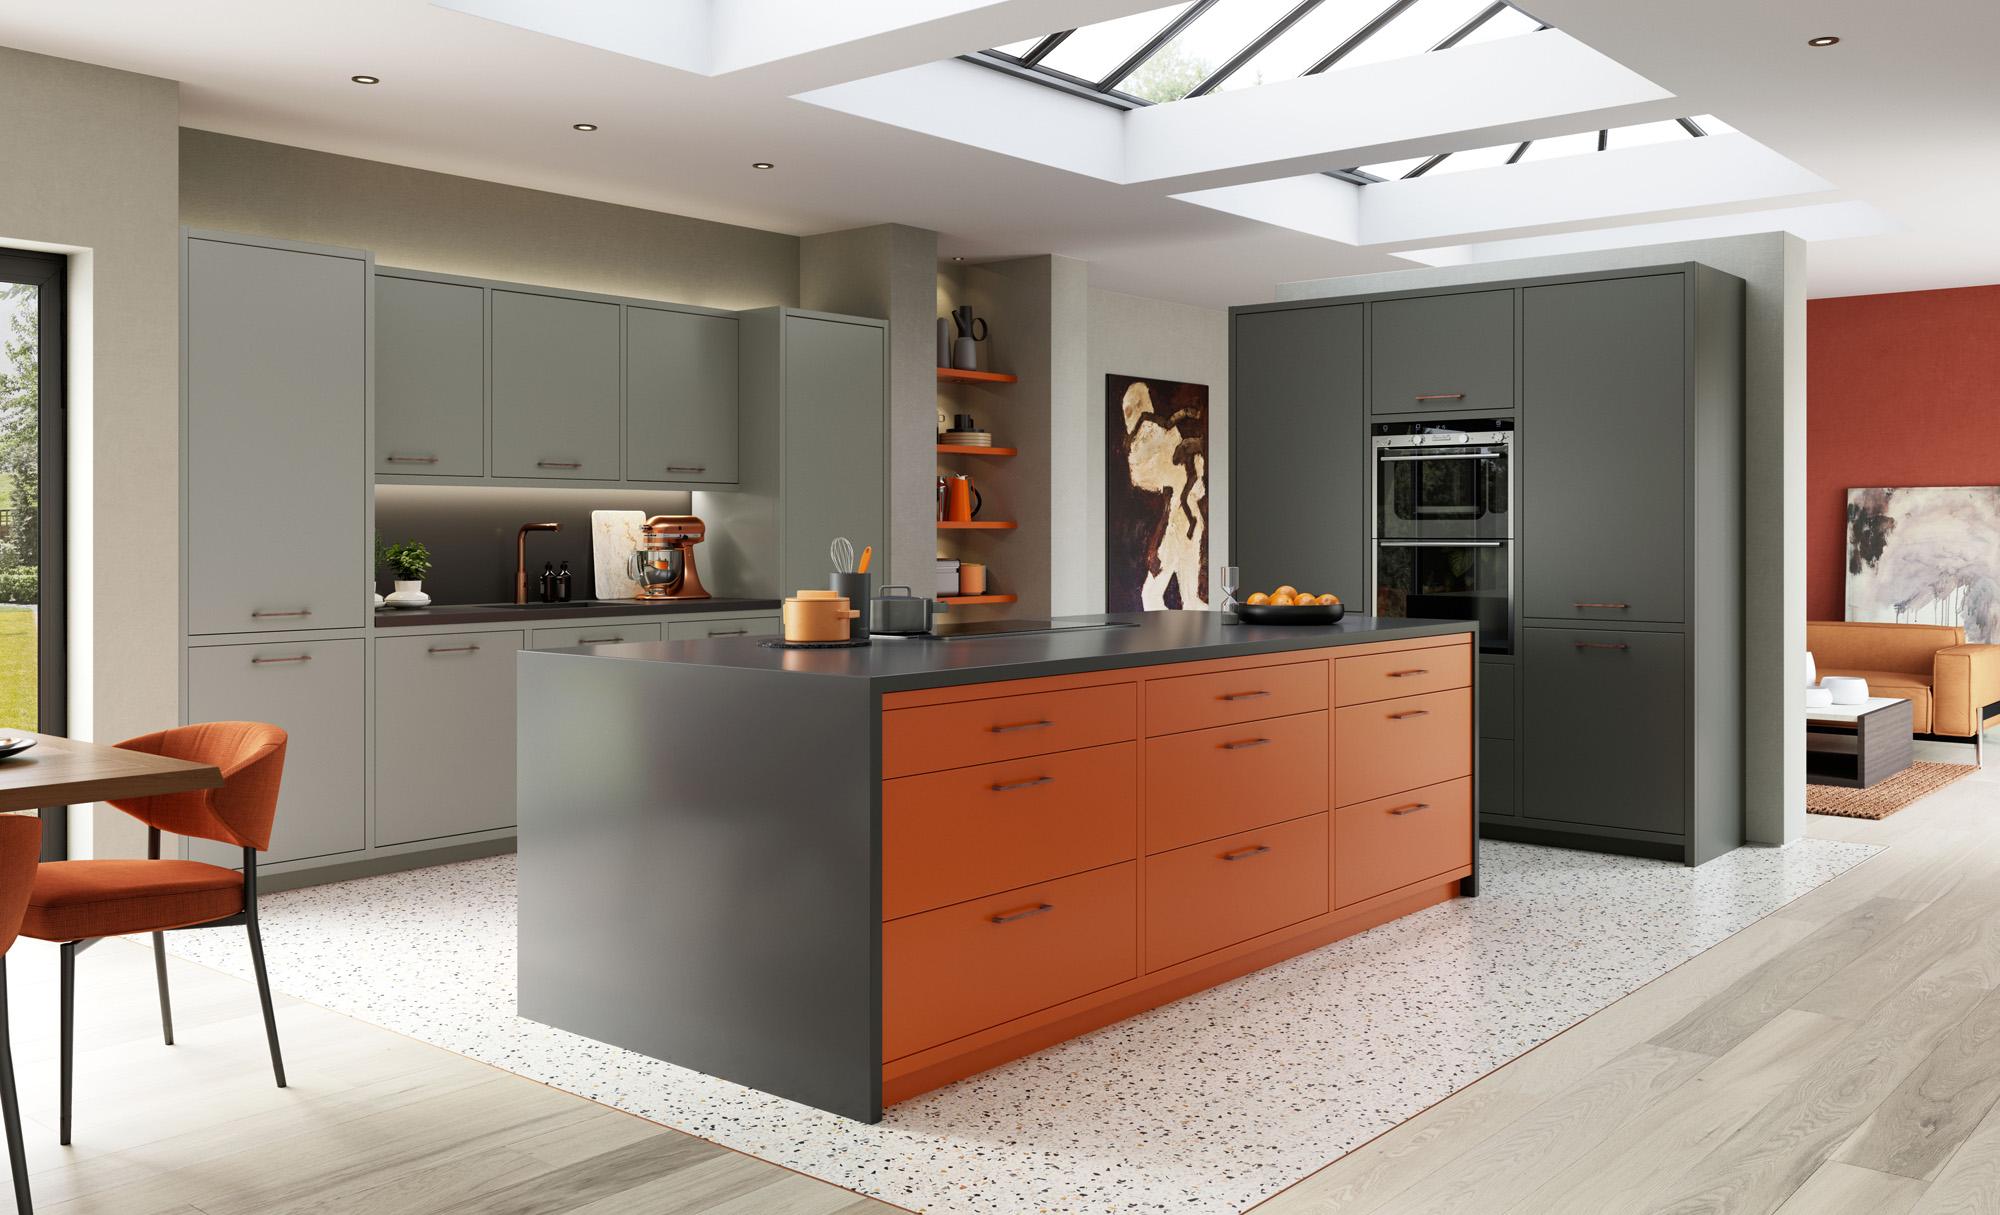 Kitchens Painted Orange Acnn Decor,Spa Website Inspiration